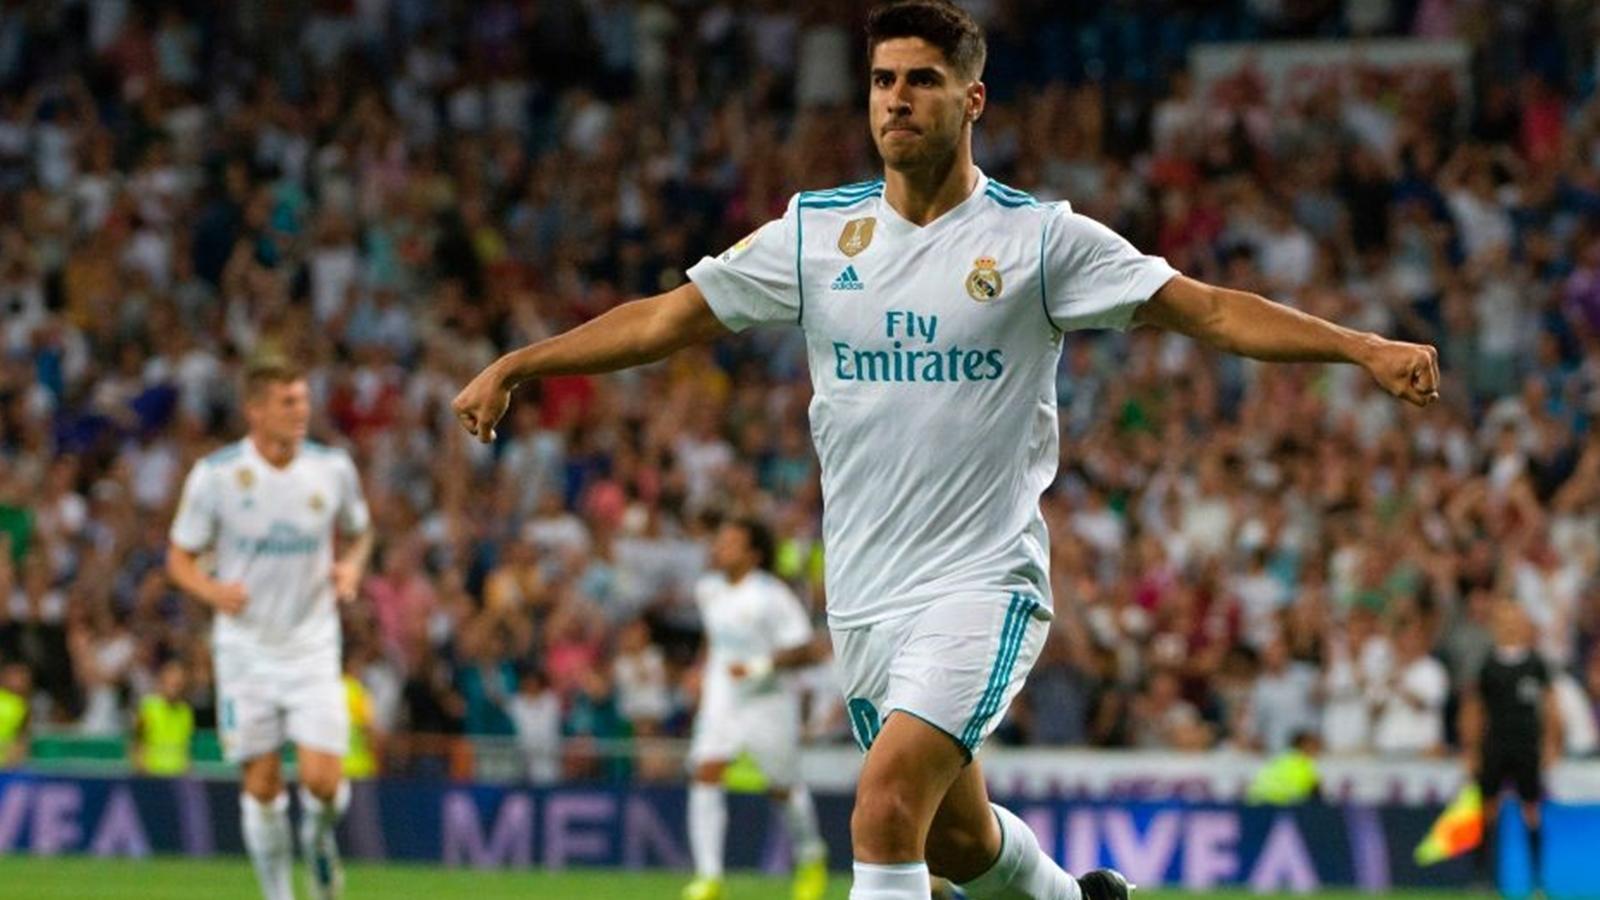 Marco Asensio named best U-21 player ahead of Dele Alli and Kylian Mbappe